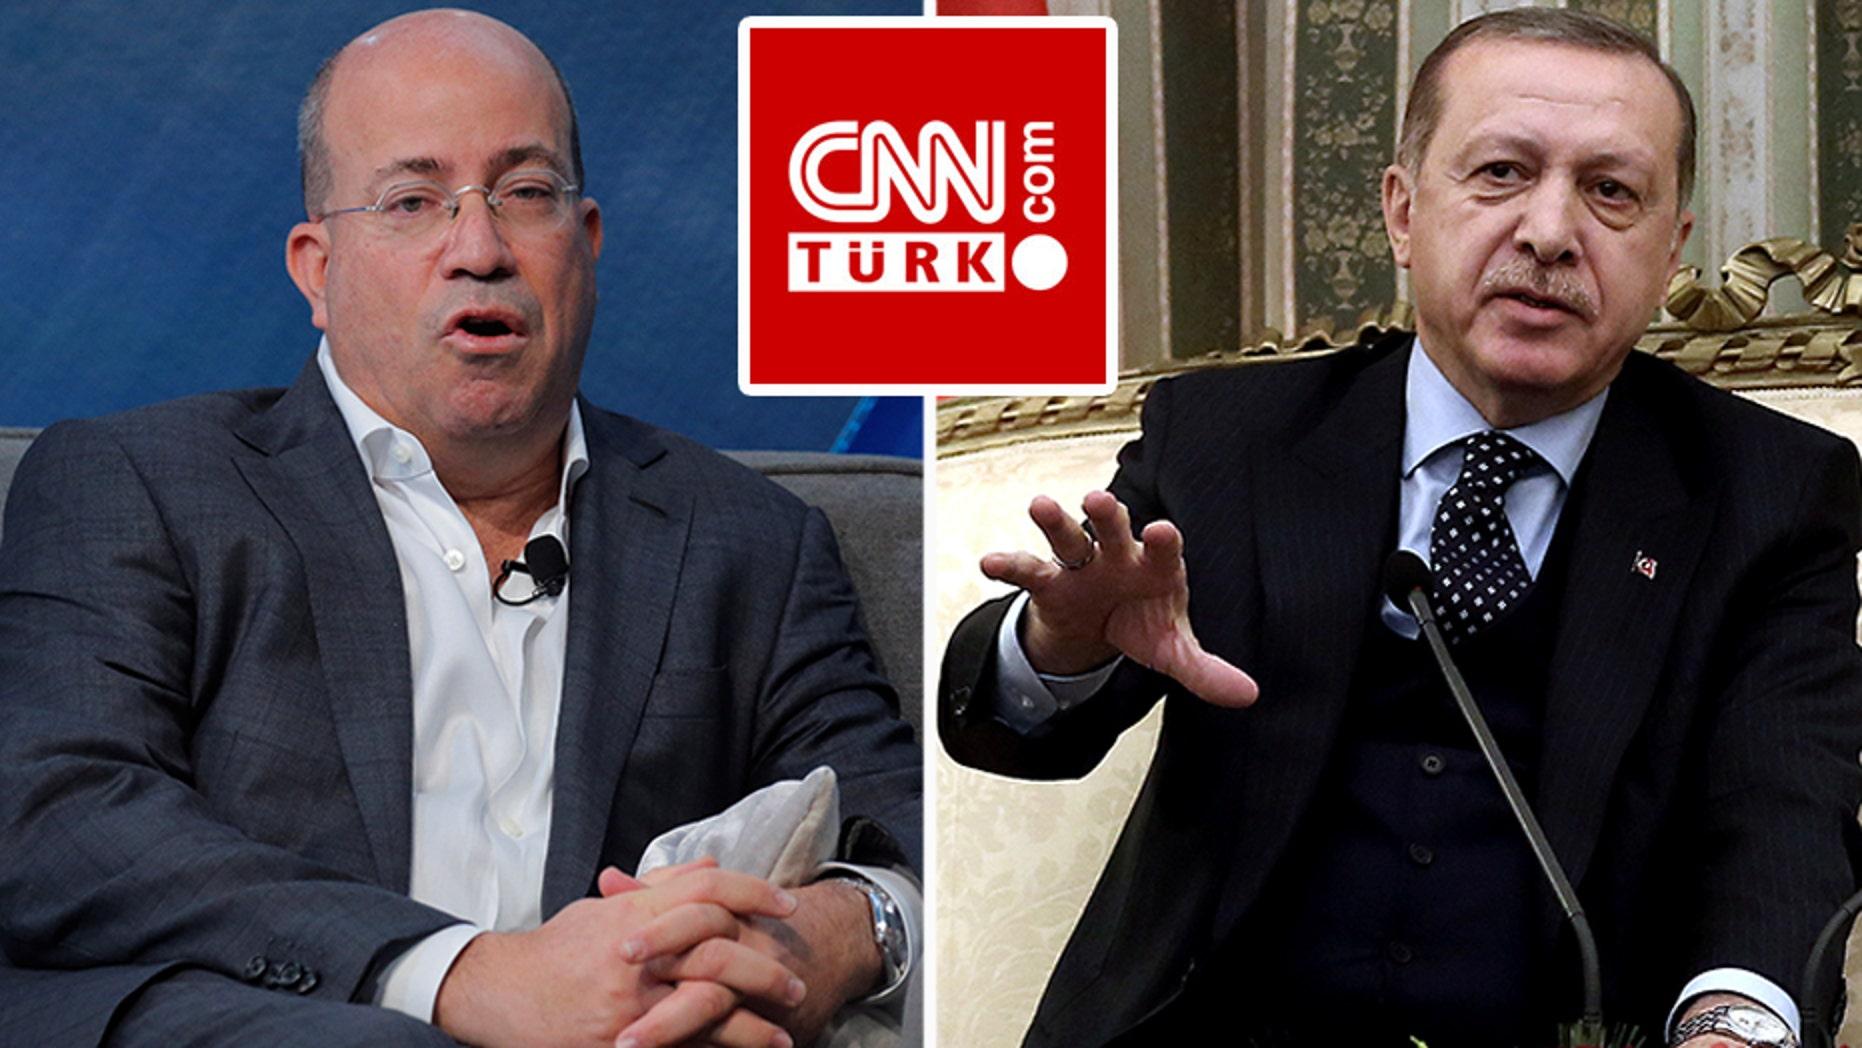 CNN Worldwide president Jeff Zucker accepts a licensing fee from the controversial, pro-Turkish President Tayyip Erdogan network CNN Turk.